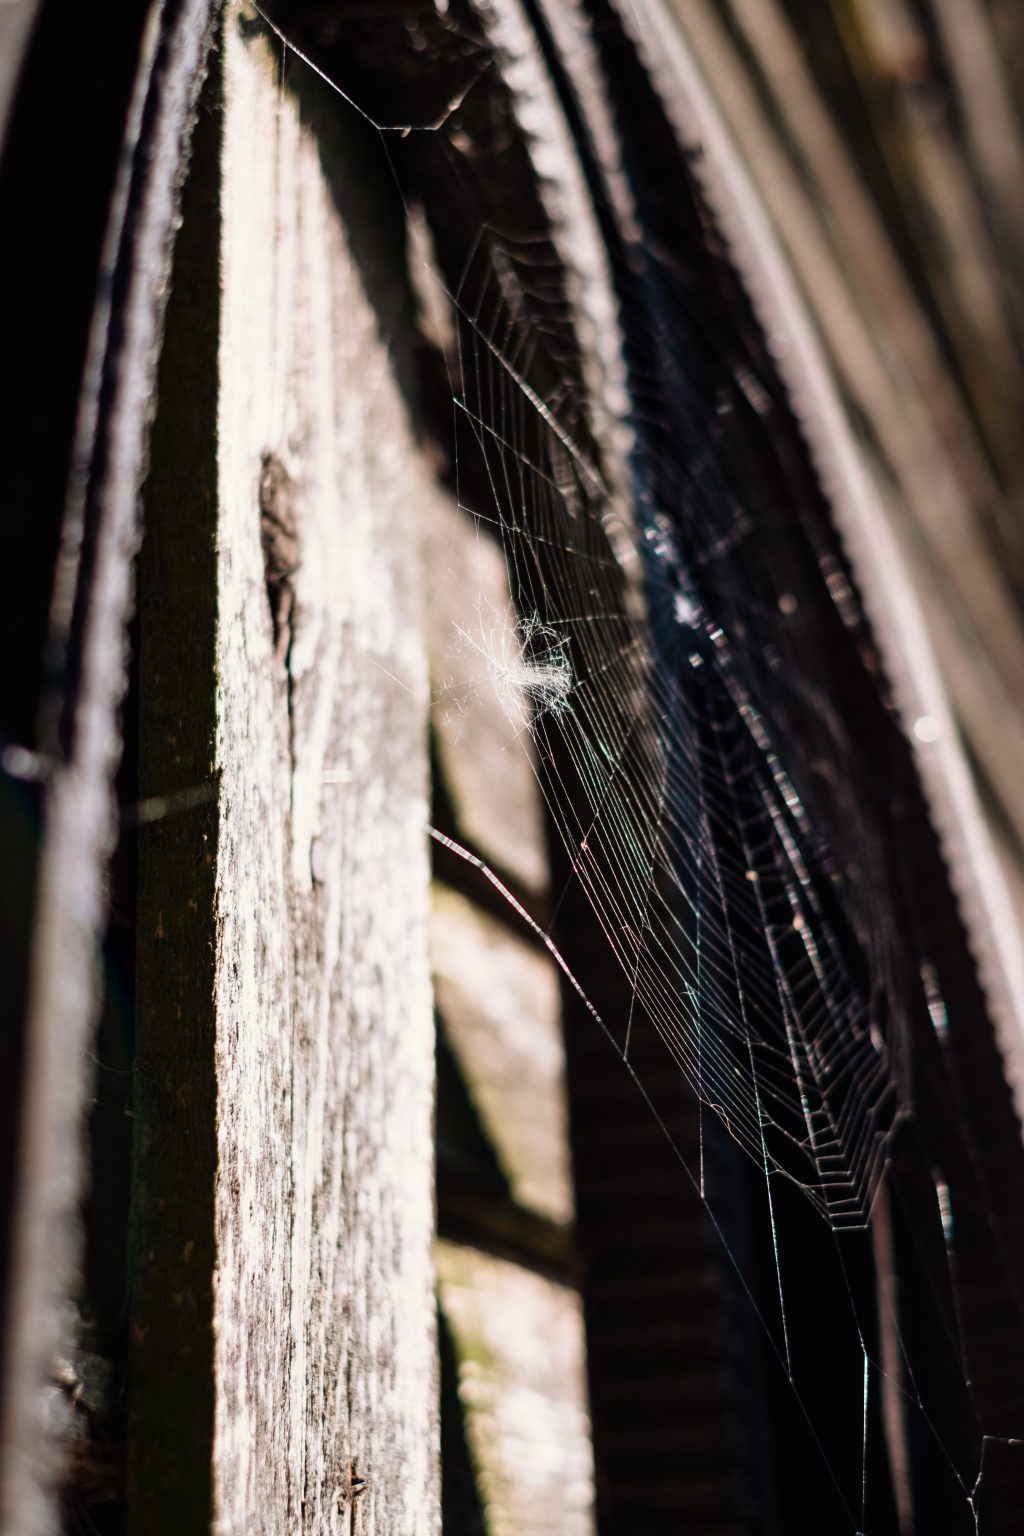 Spider's web 2 - free stock photo